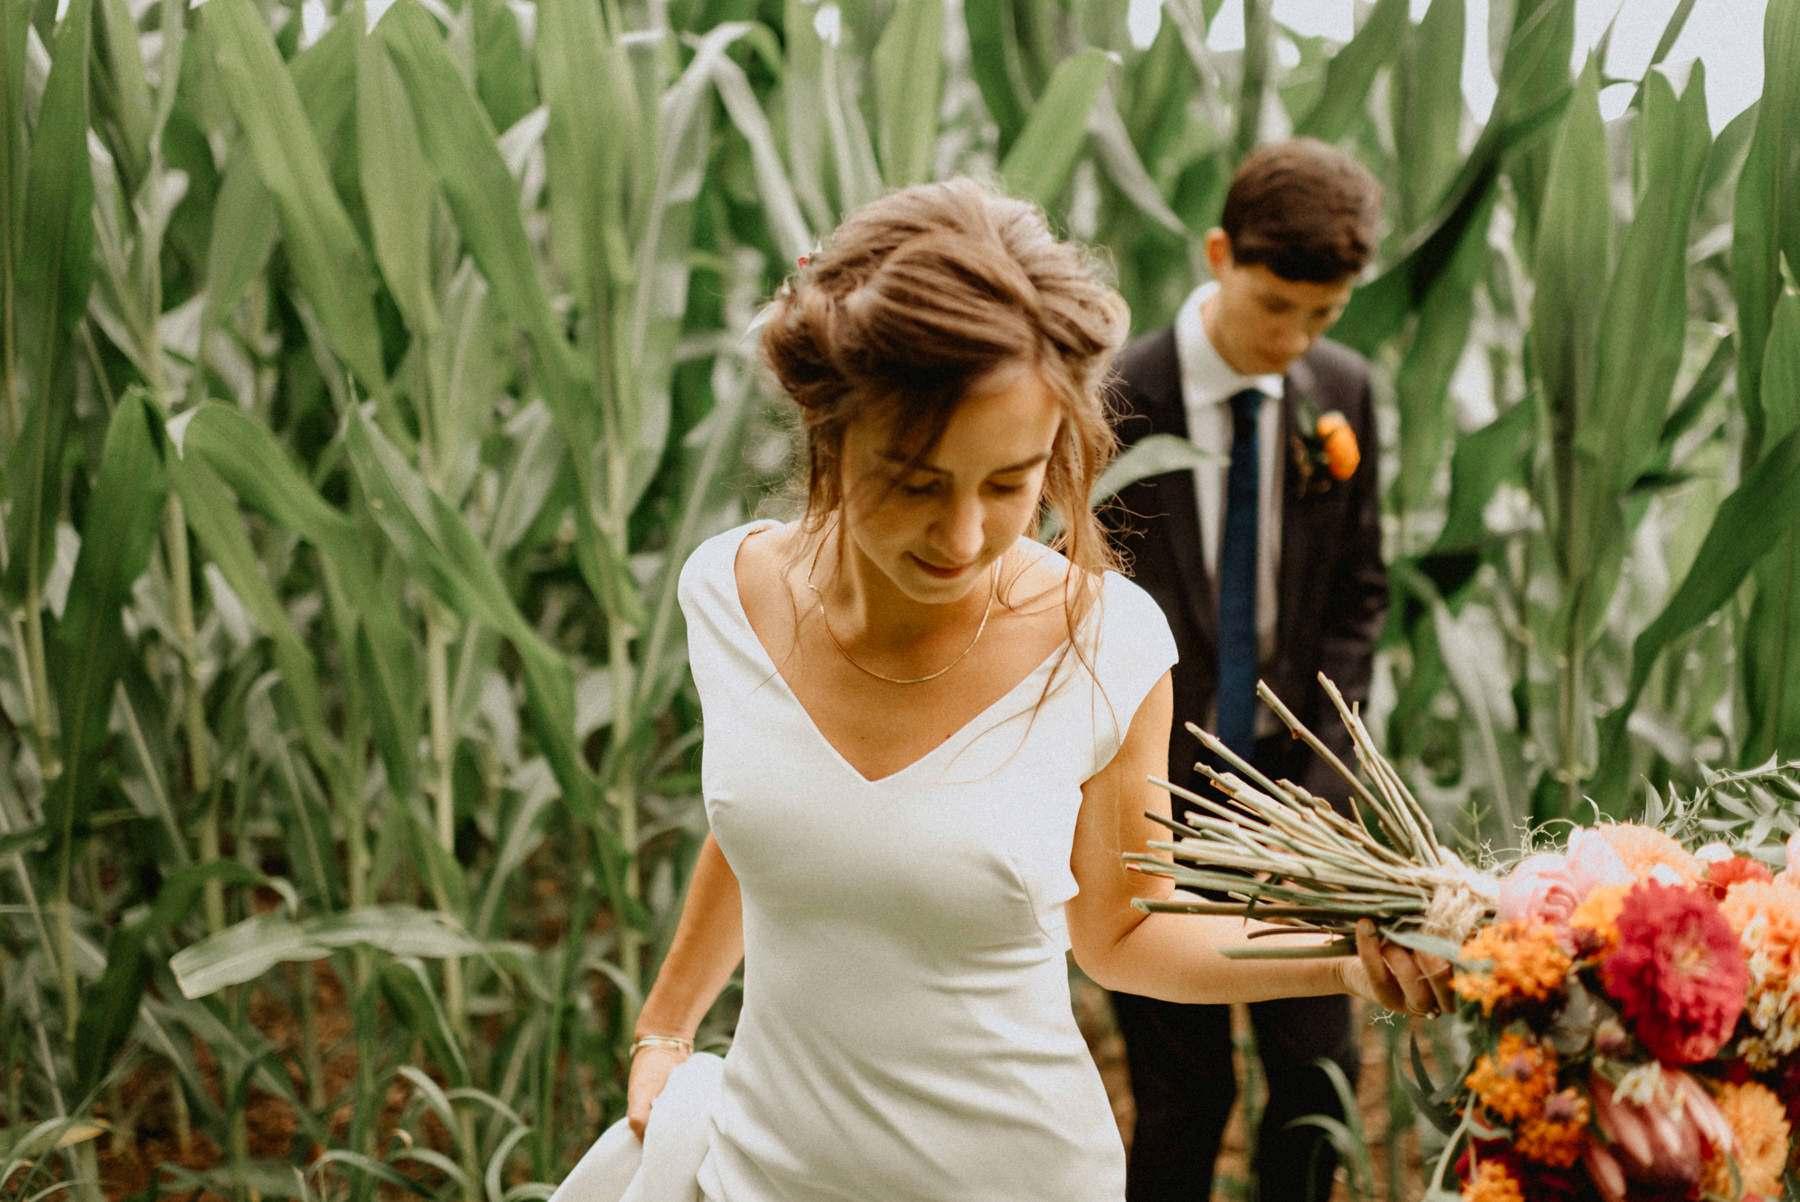 pennsylvania-private-estate-wedding-47.jpg